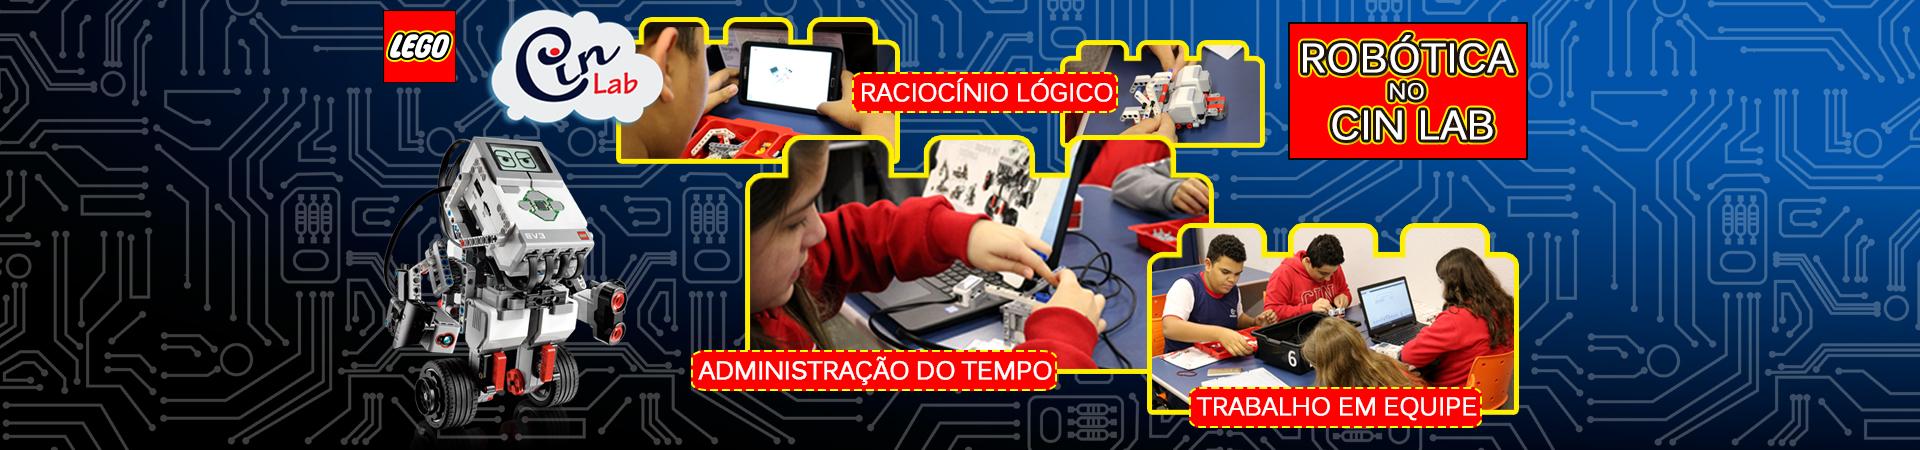 slide-robotica-cinlab-full-2